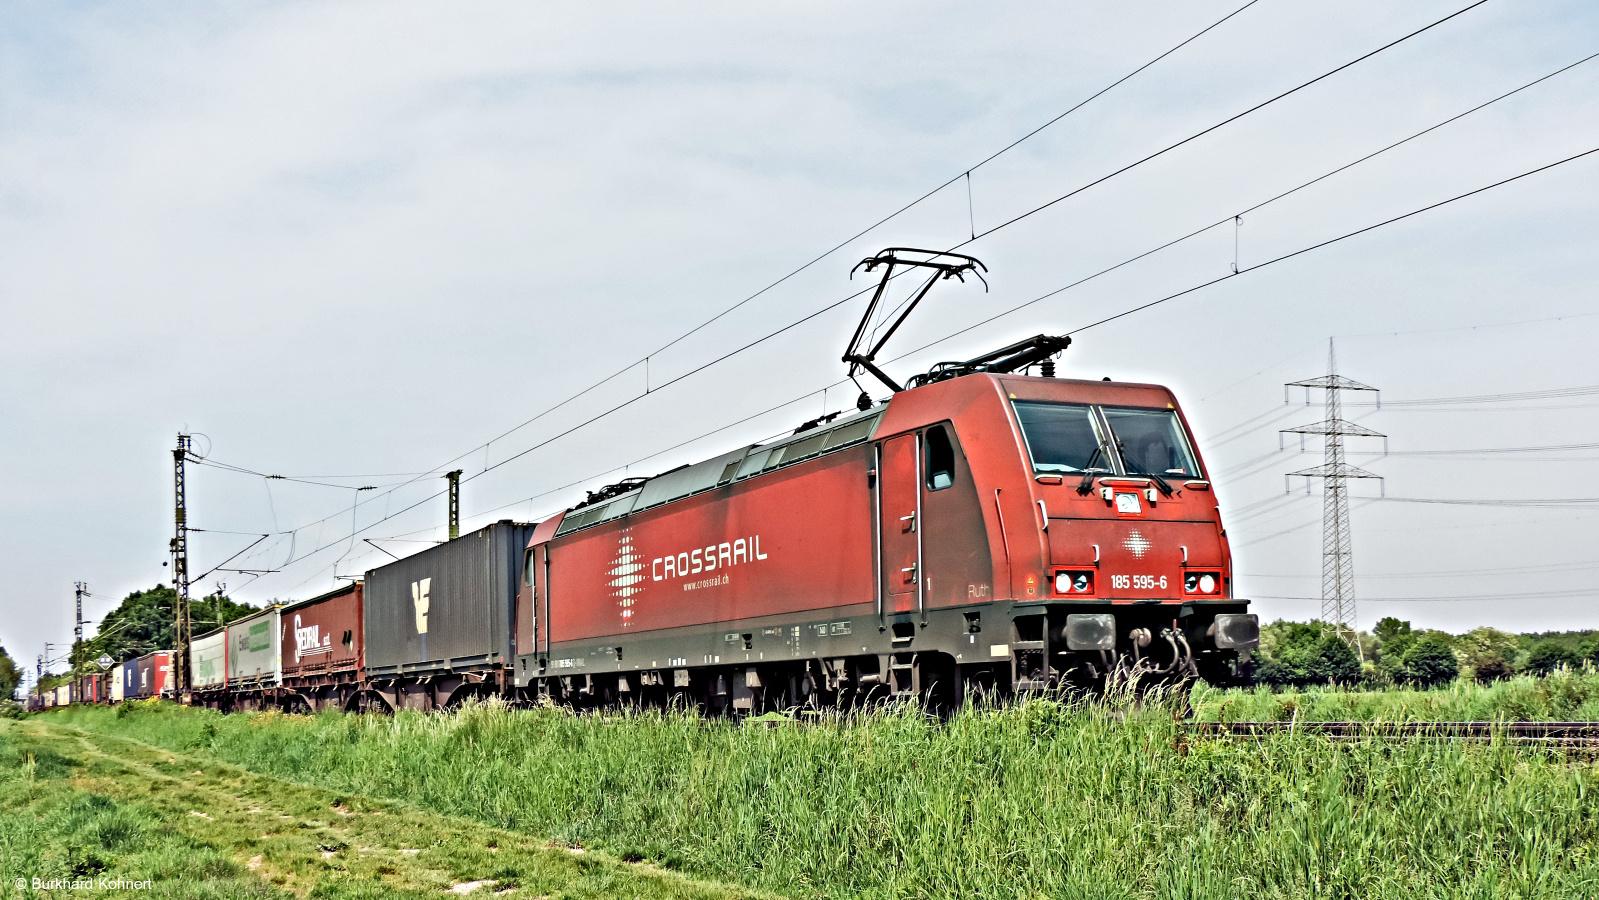 185 595-6 Crossrail